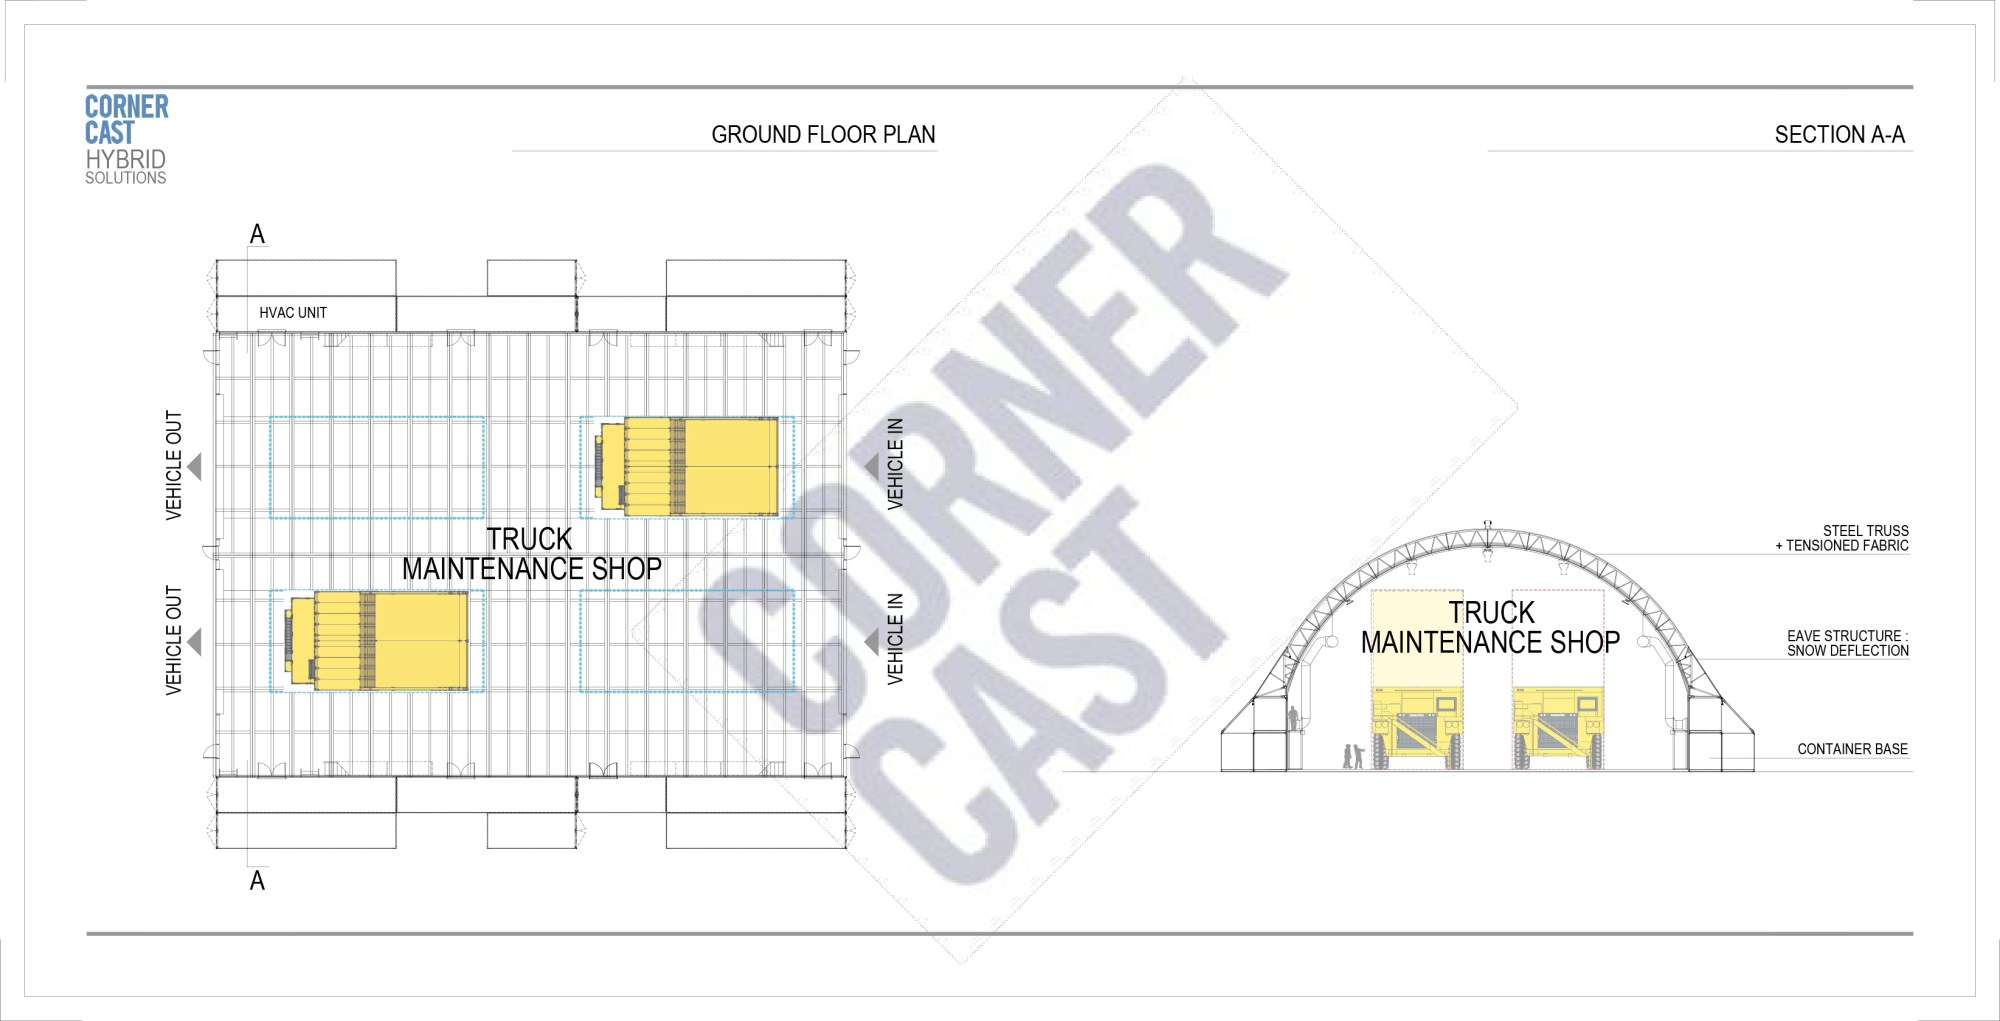 hight resolution of corner cast diagram wiring diagram user corner cast diagram